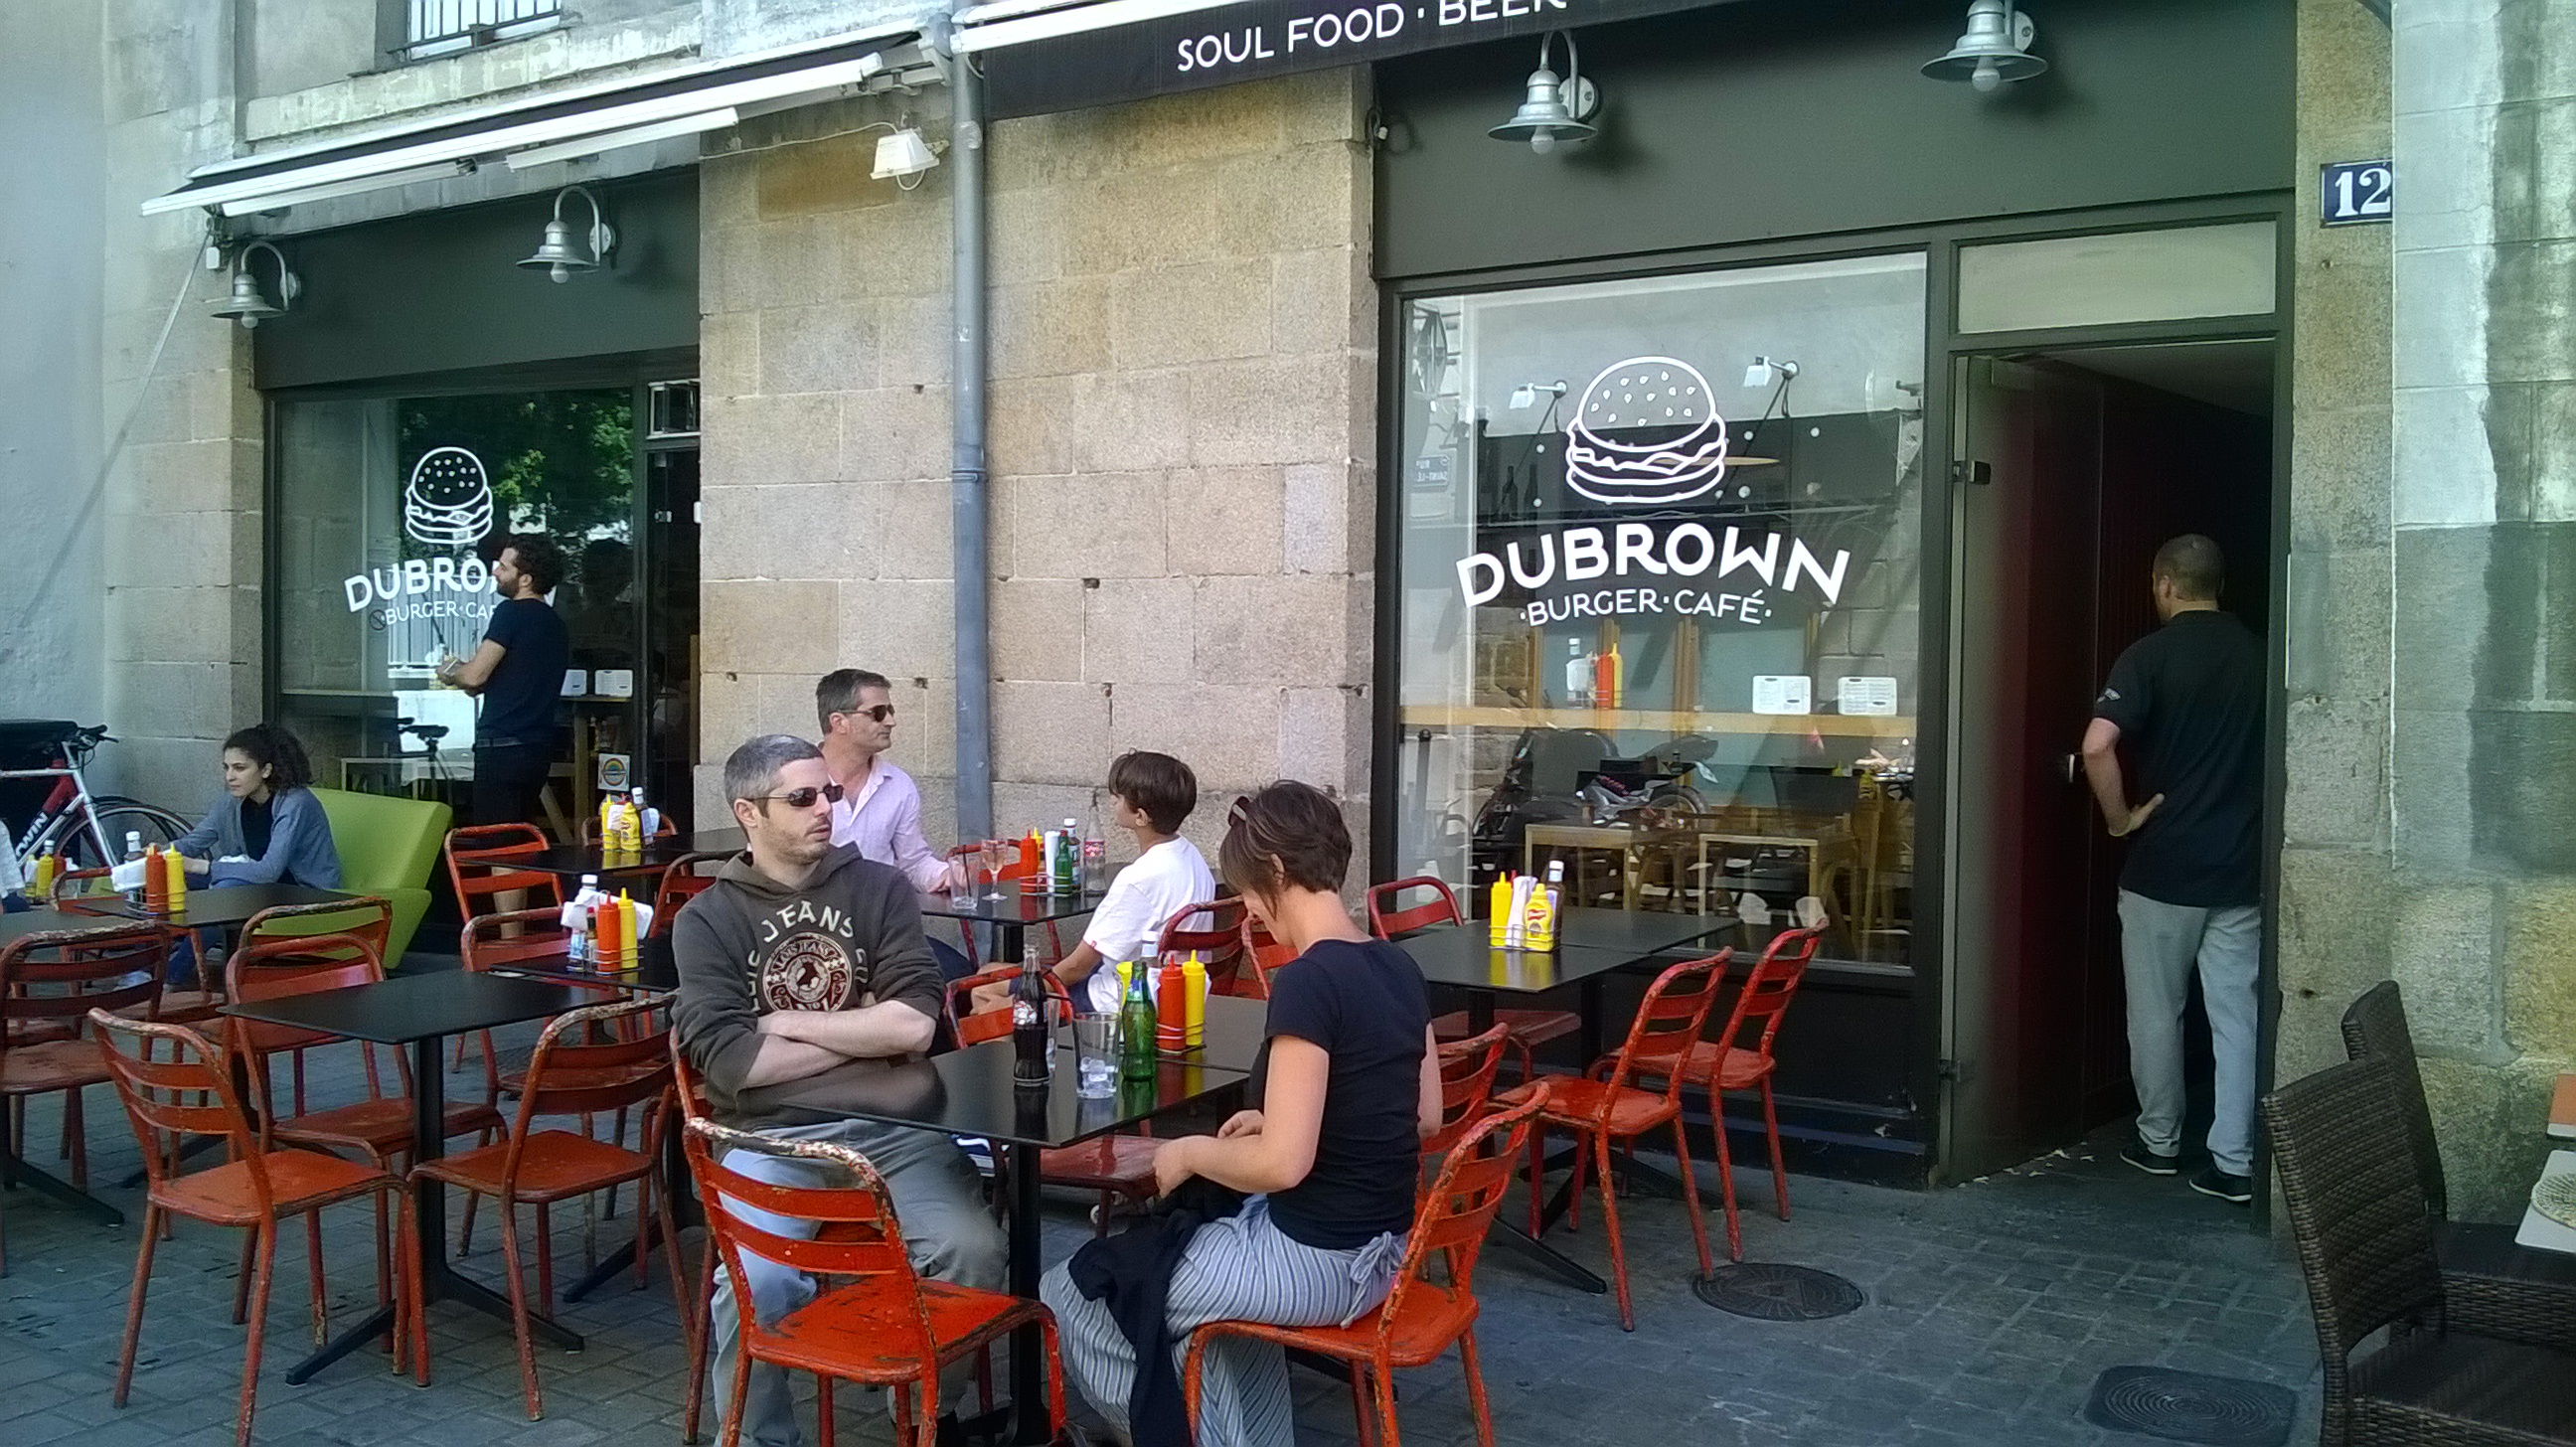 Dubrown : les burgers insolites de Nantes